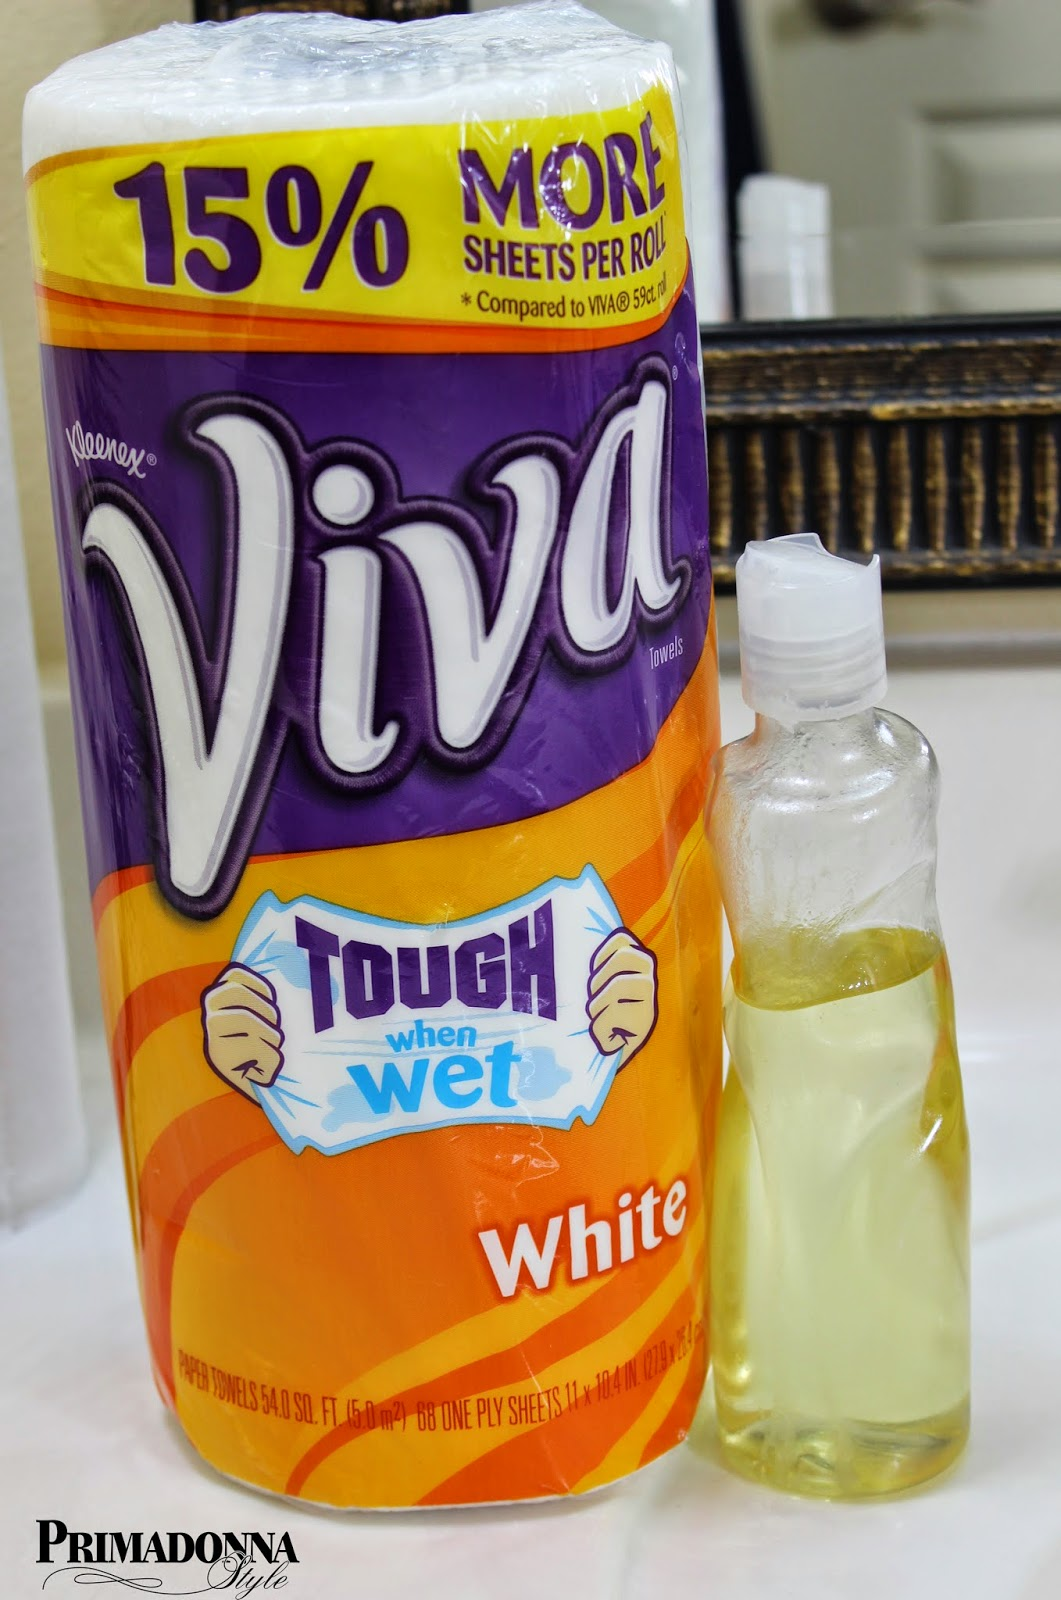 Viva Paper Towel Logo I use viva paper towelsViva Paper Towel Logo